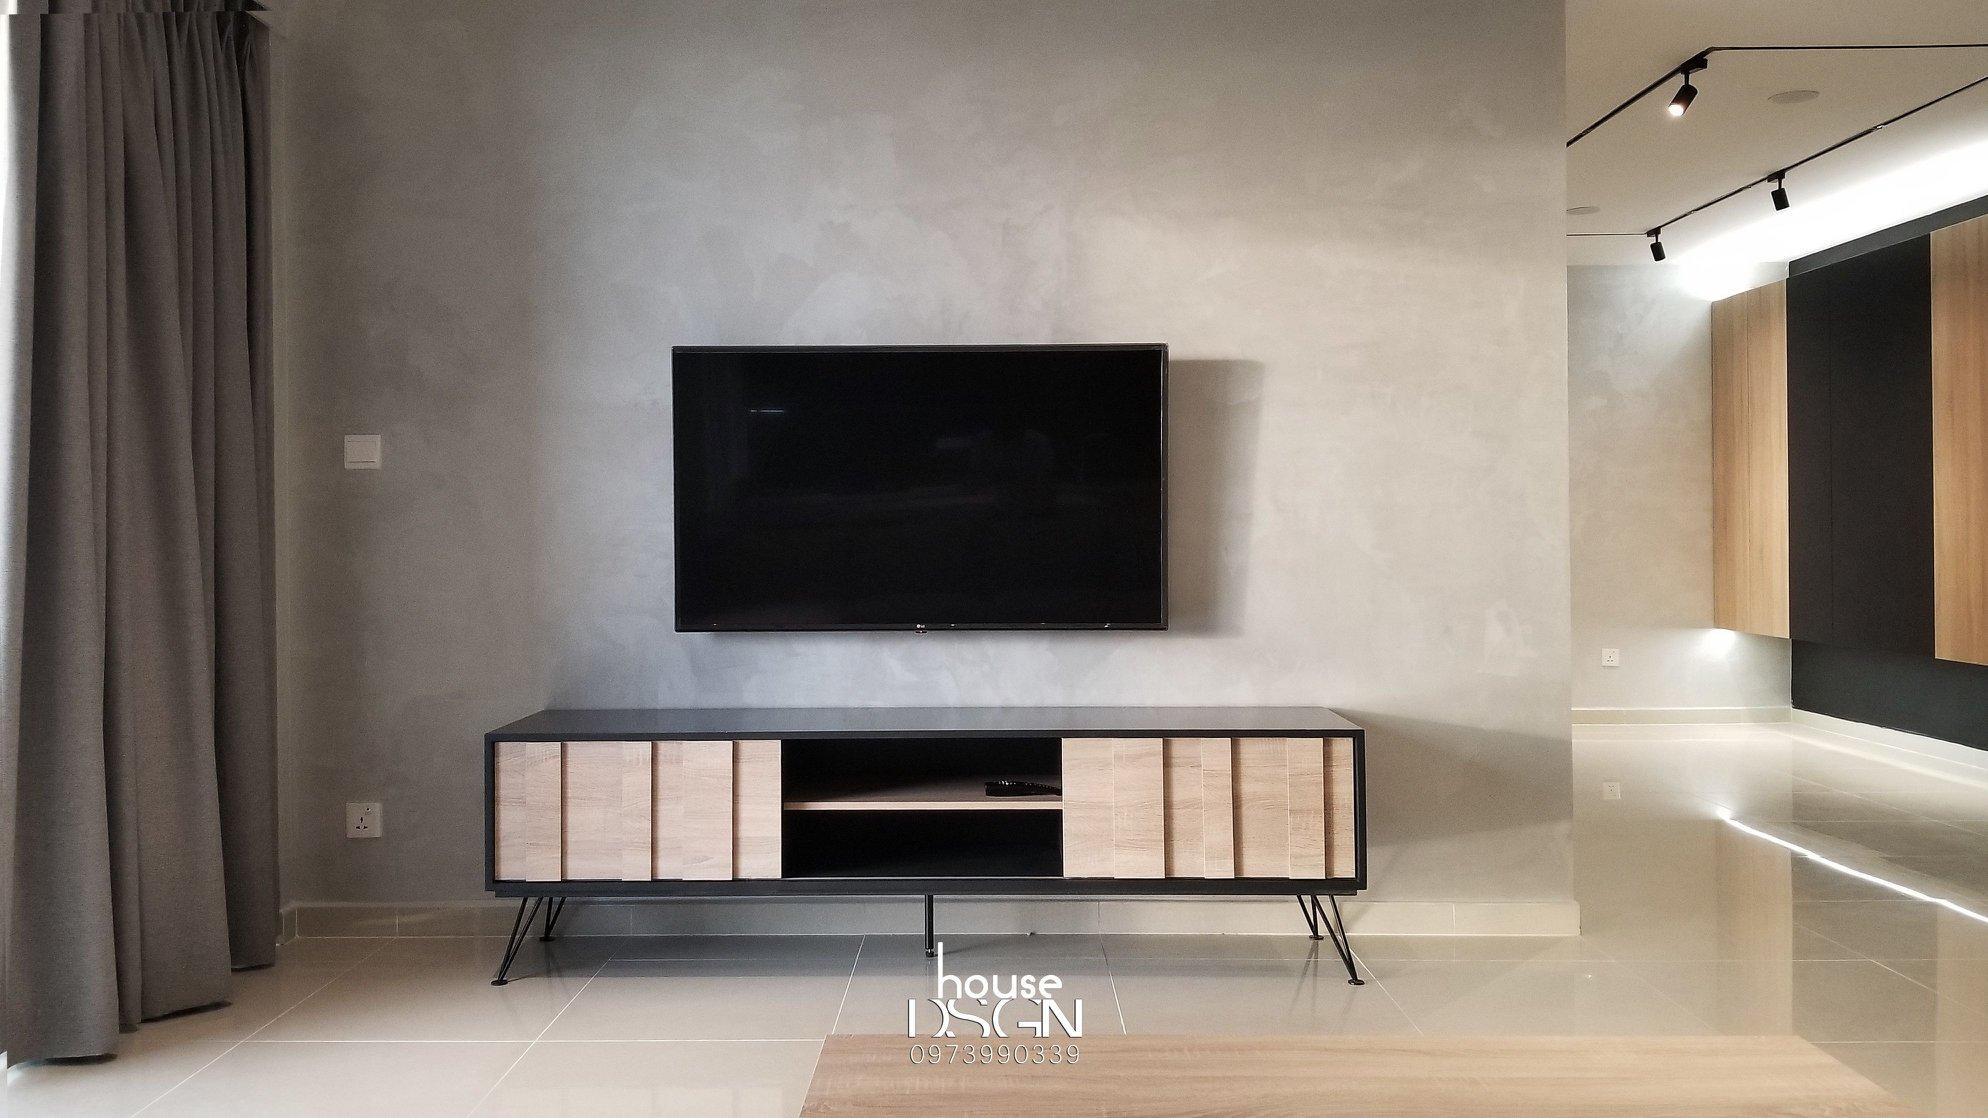 đồ nội thất - Housedesign